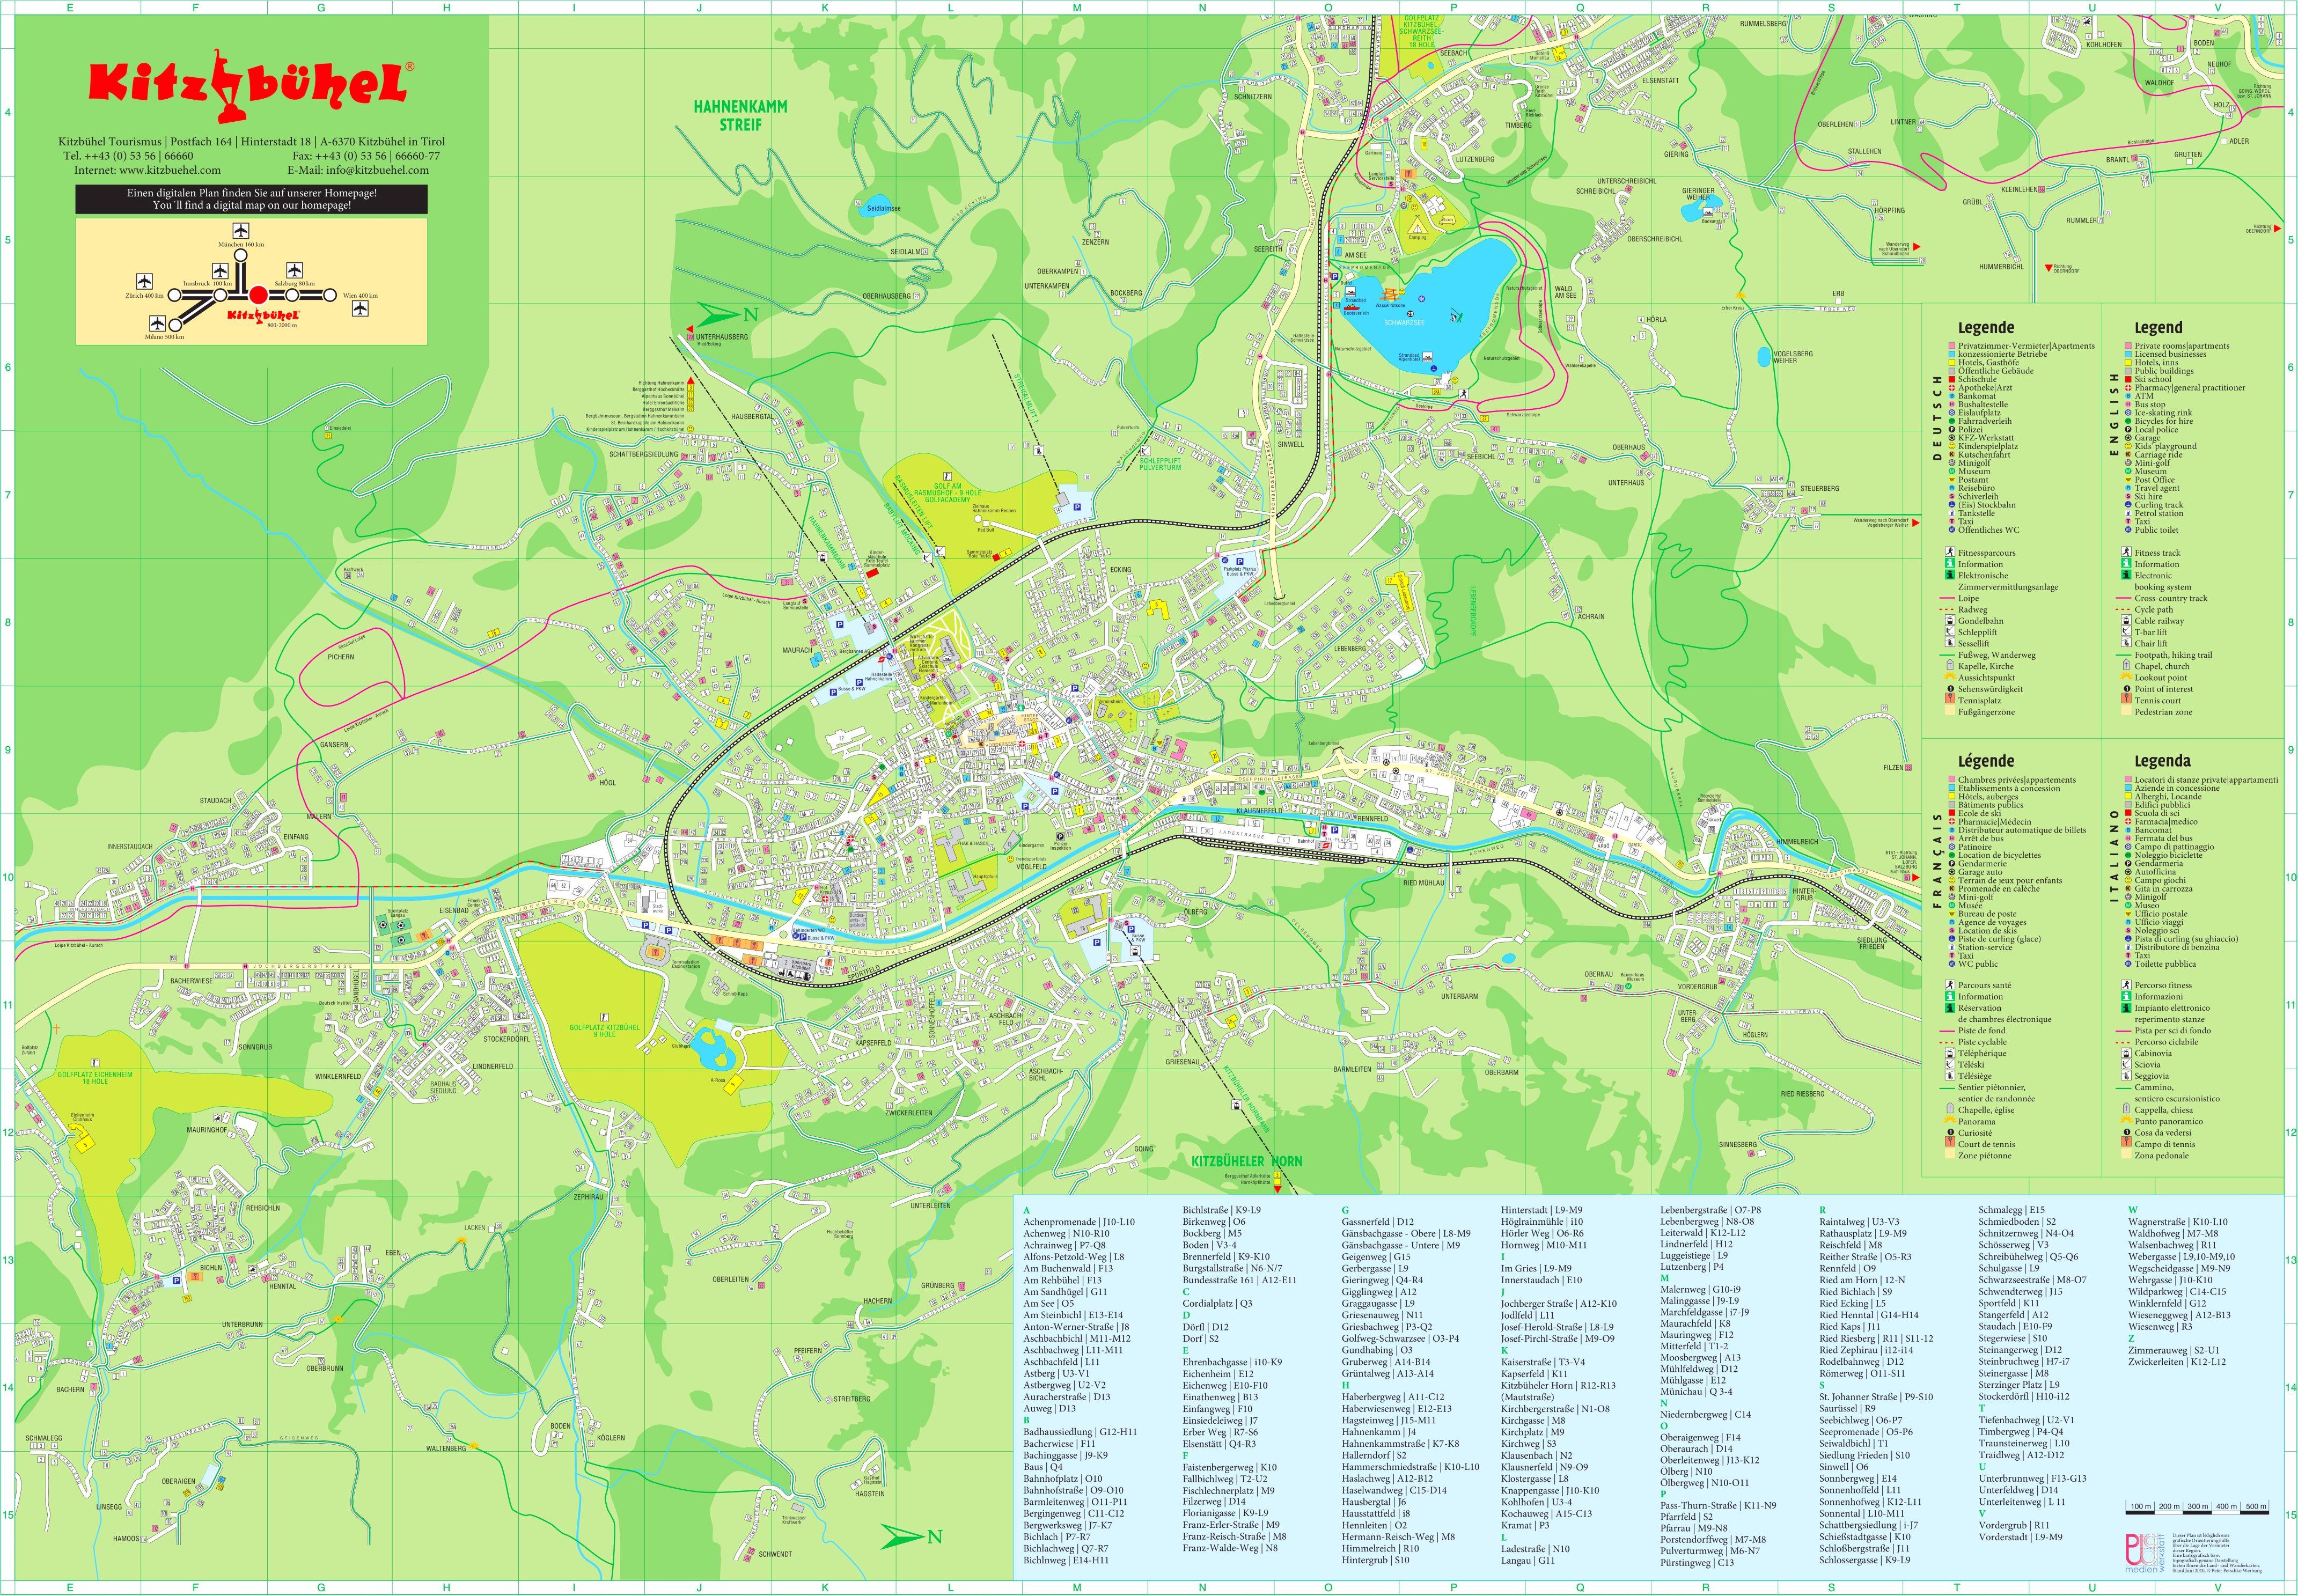 Kitzbühel tourist map on brussels austria map, attersee austria map, otztal austria map, munich austria map, austria mountains map, arlberg austria map, berlin austria map, igls austria map, innsbruck austria map, wien austria map, altmunster austria map, budapest austria map, mondsee austria map, linz austria map, mayrhofen austria map, mariazell austria map, gosau austria map, eisenstadt austria map, salzburg austria map, zurich austria map,